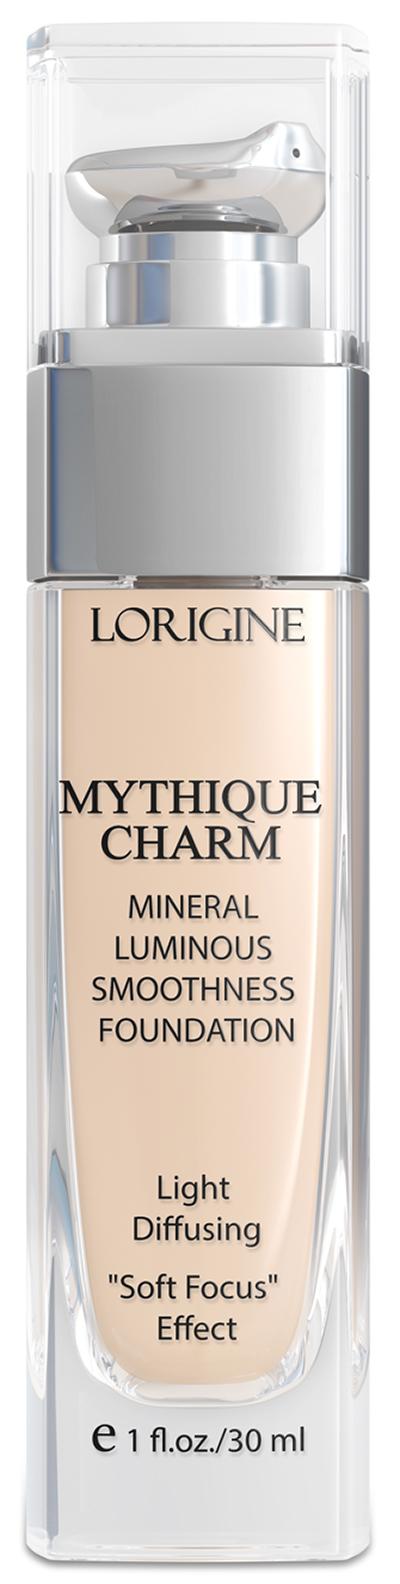 Lorigine Mythique Charm - dlouhotrvající Make-up, 30 ml